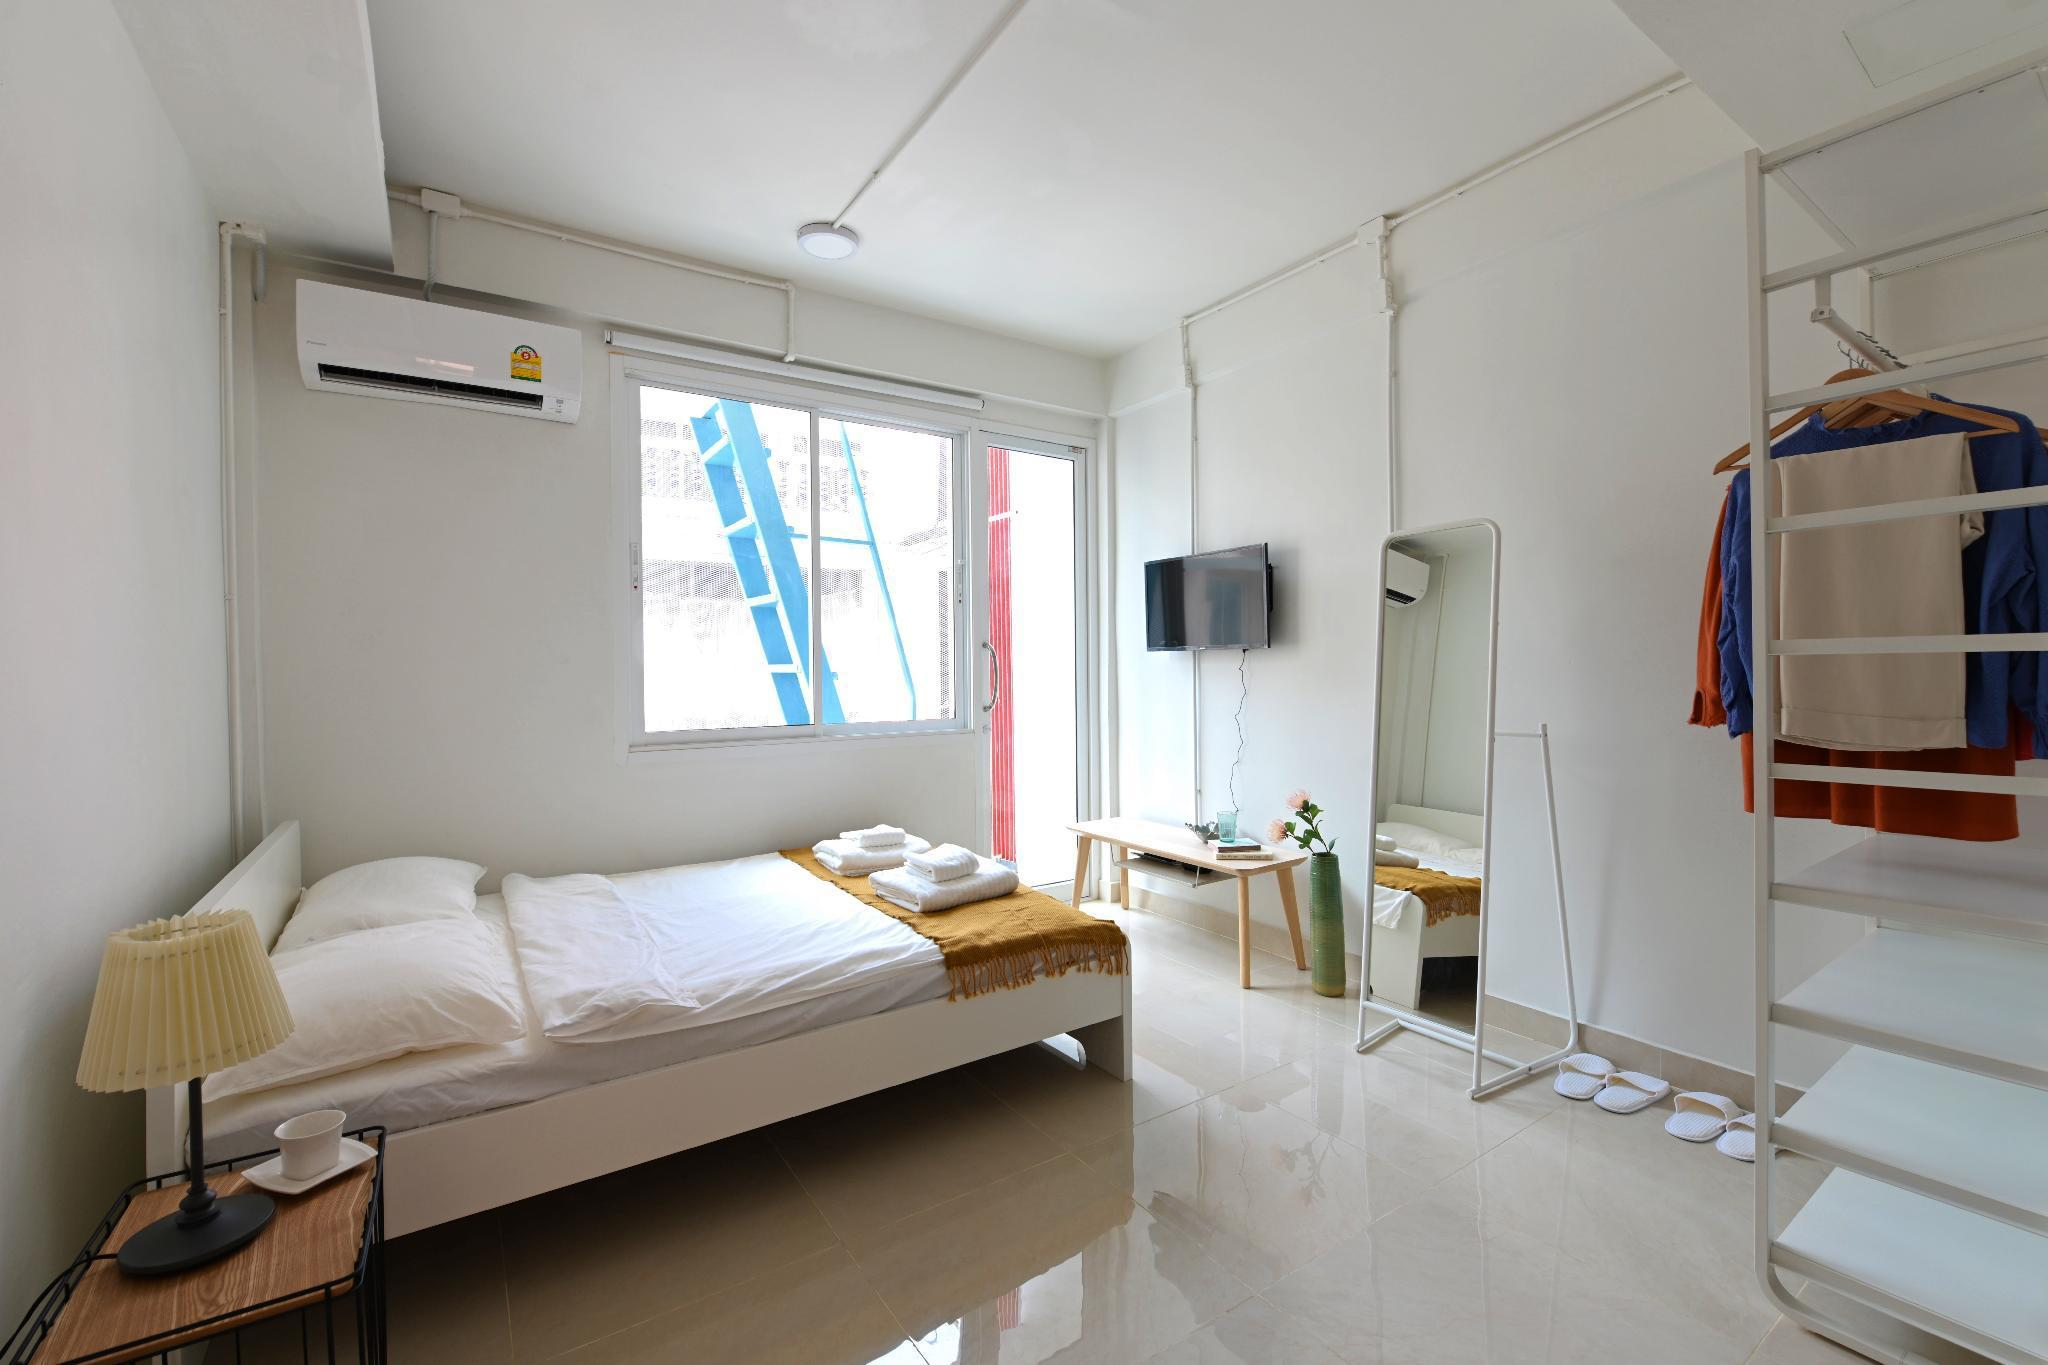 Cozy Room in Center Sukhumvit41 BTS Phrom Phong อพาร์ตเมนต์ 1 ห้องนอน 1 ห้องน้ำส่วนตัว ขนาด 19 ตร.ม. – สุขุมวิท